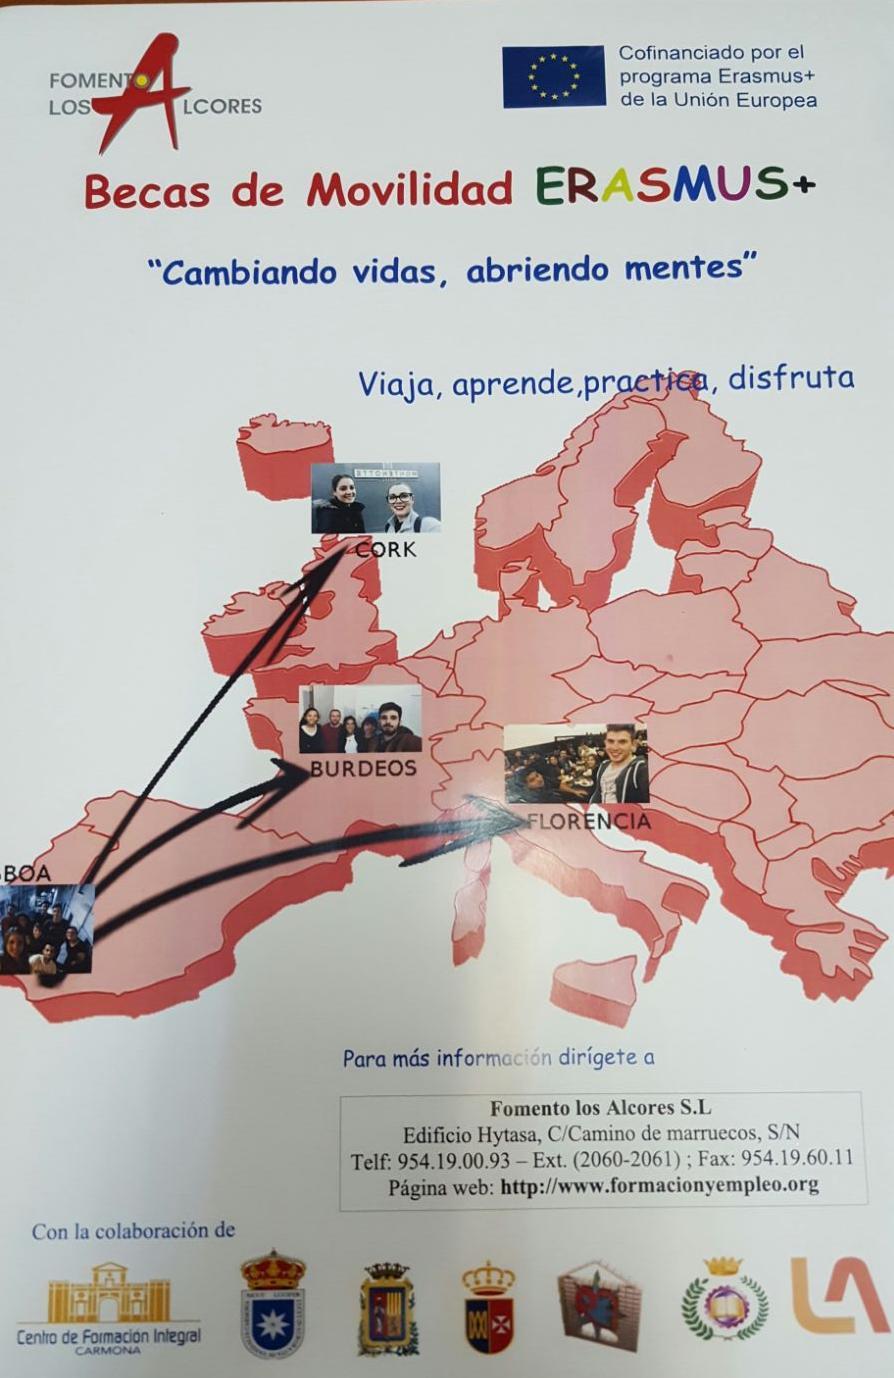 Erasmuscore5